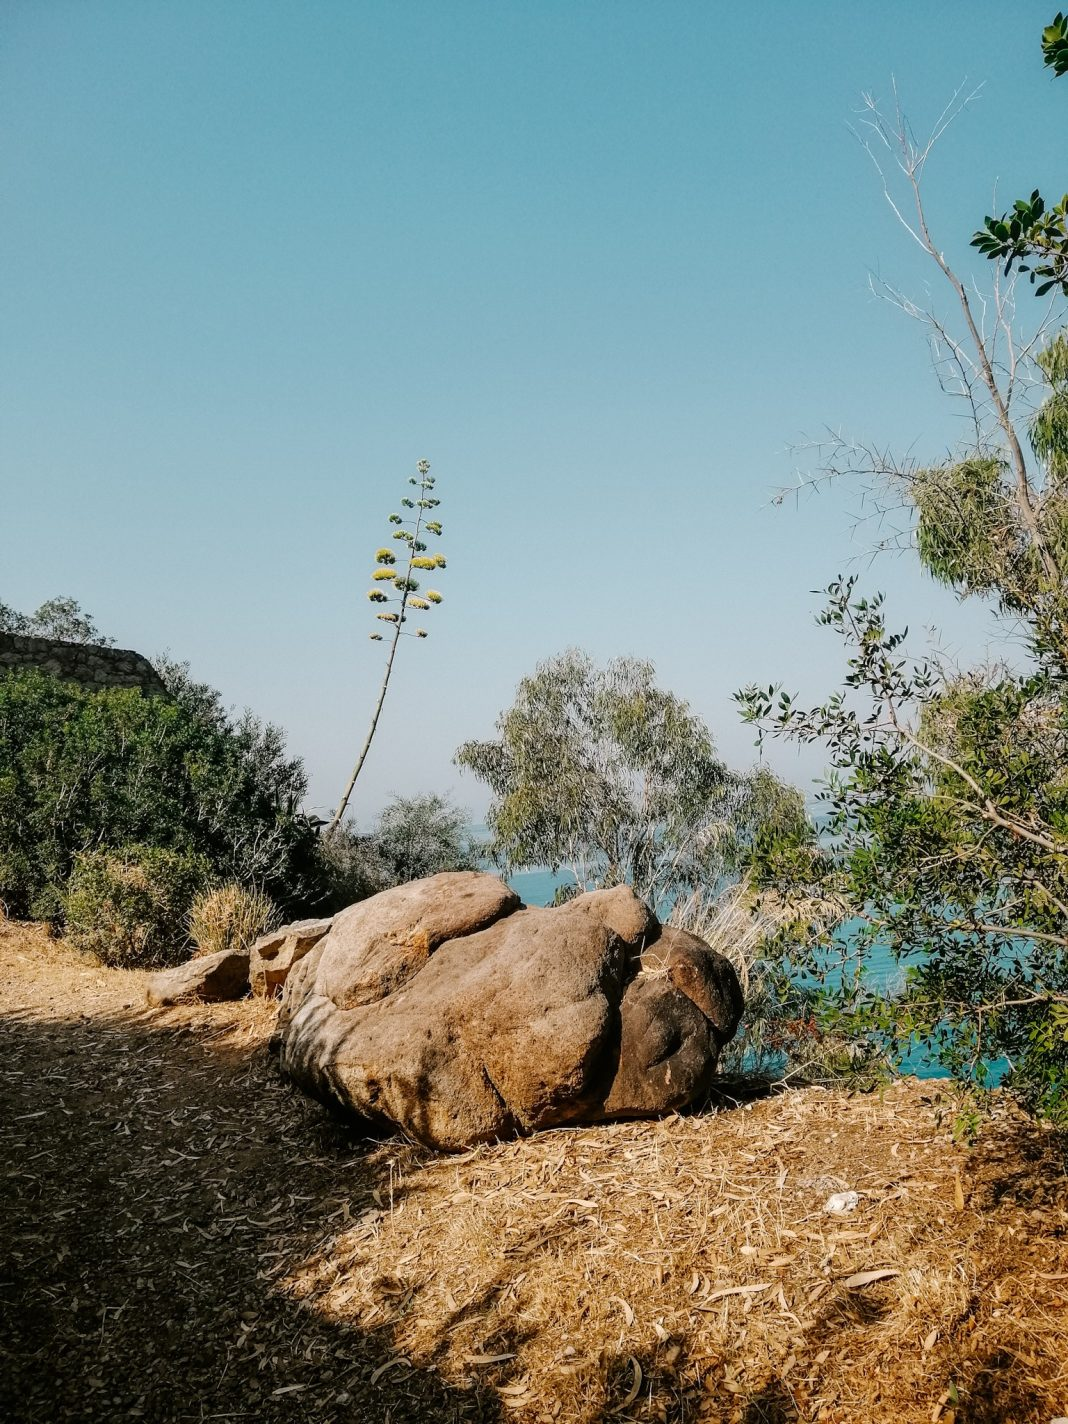 Cefalù in Oost-Sicilië